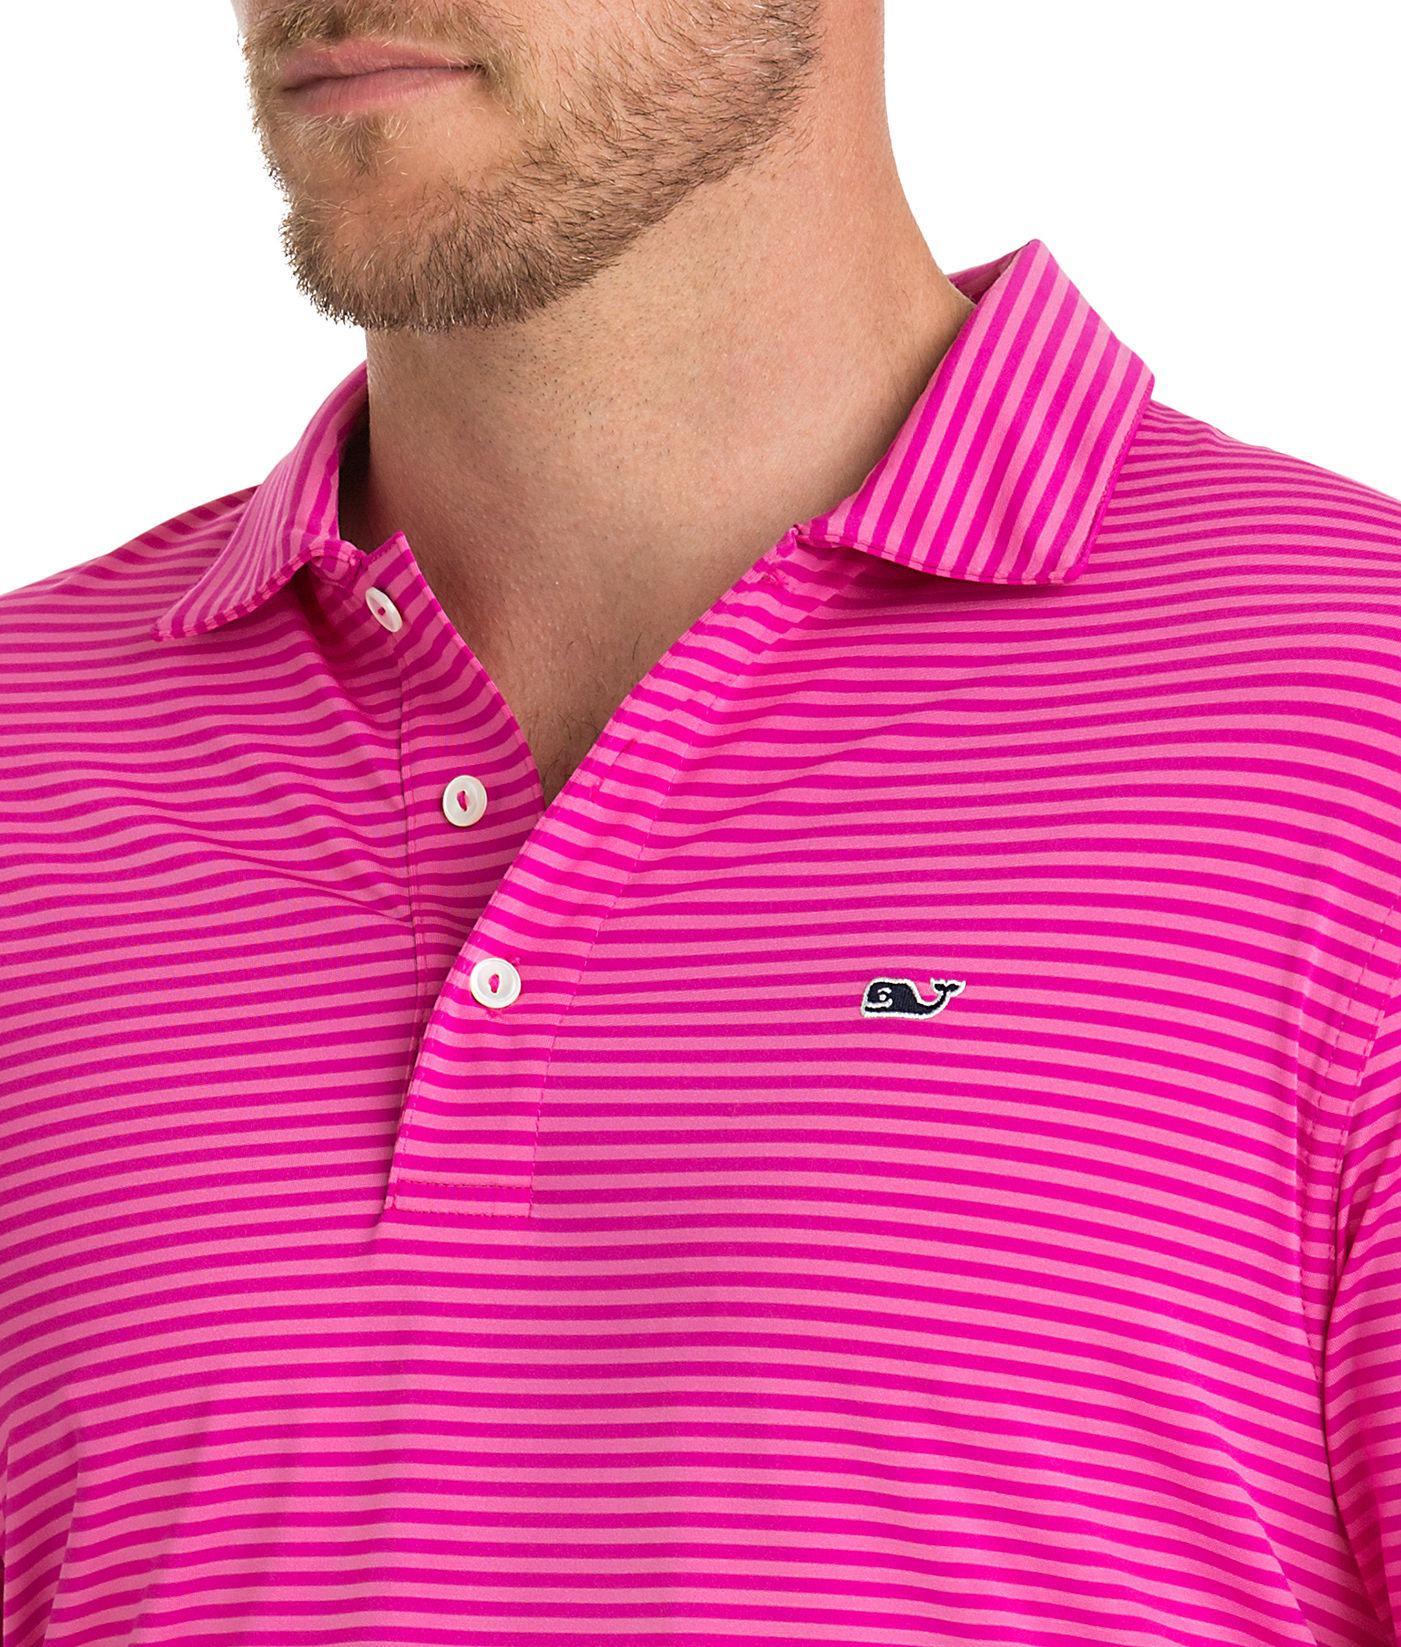 413399ff Vineyard Vines Kennedy Stripe Sankaty Performance Polo for Men - Lyst